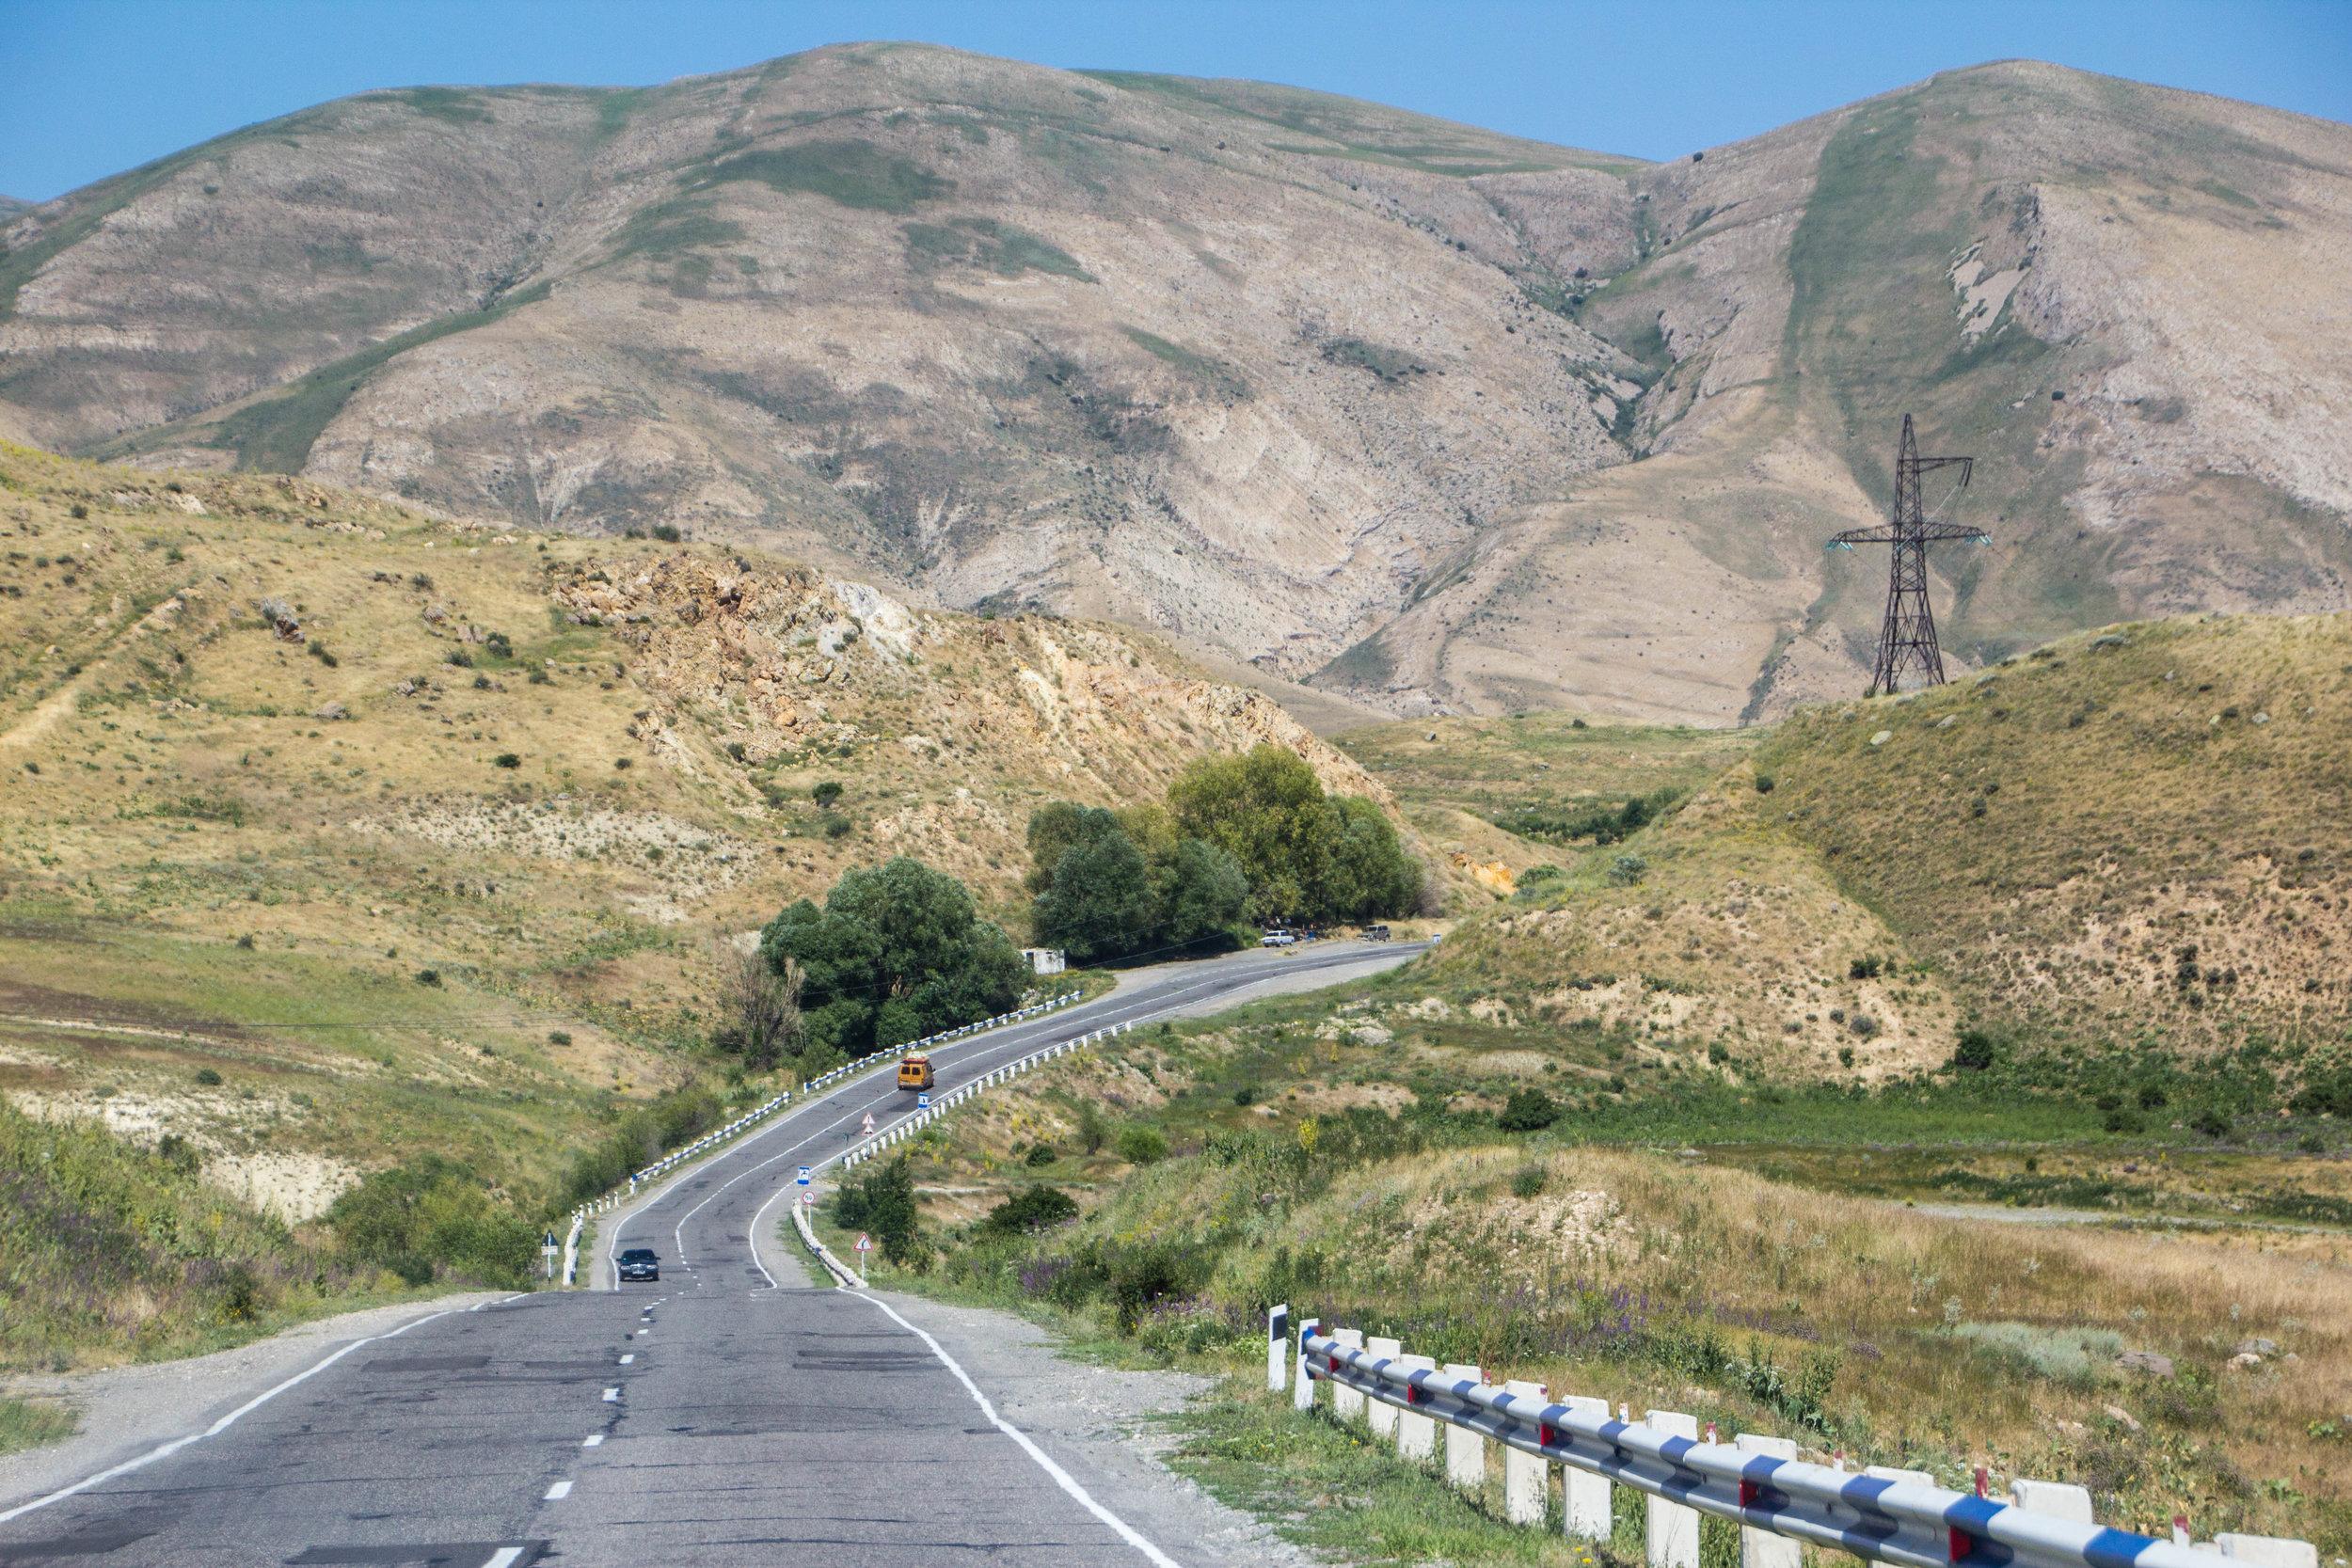 armenia-azerbaijan-southern-border-23.jpg